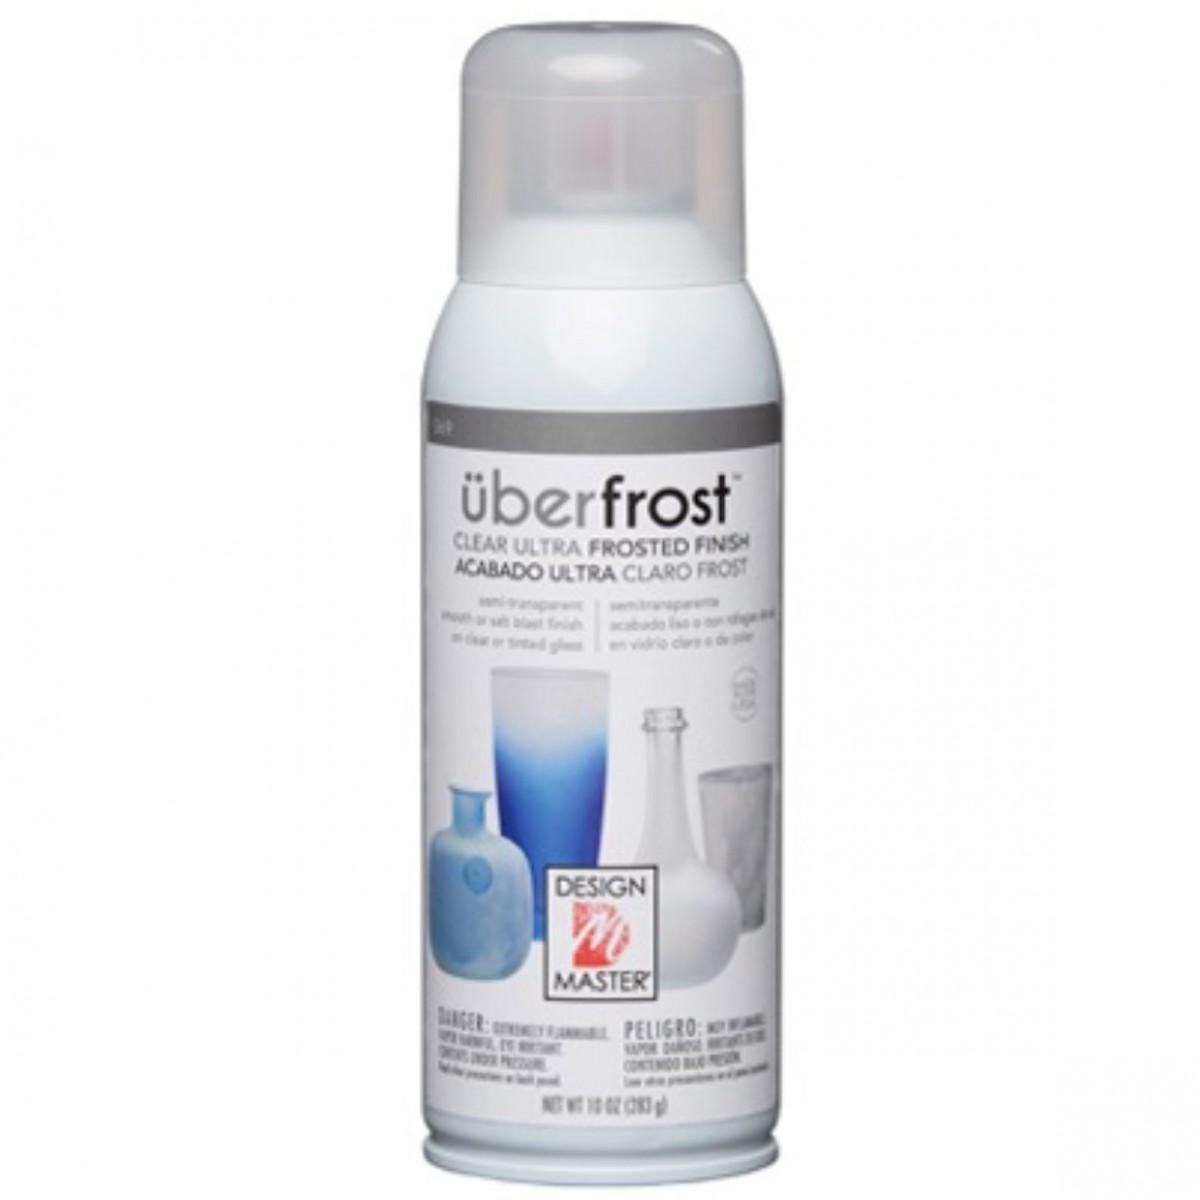 569 Uber Frost DM Uberfrost Colour Spray Paint - 1 No